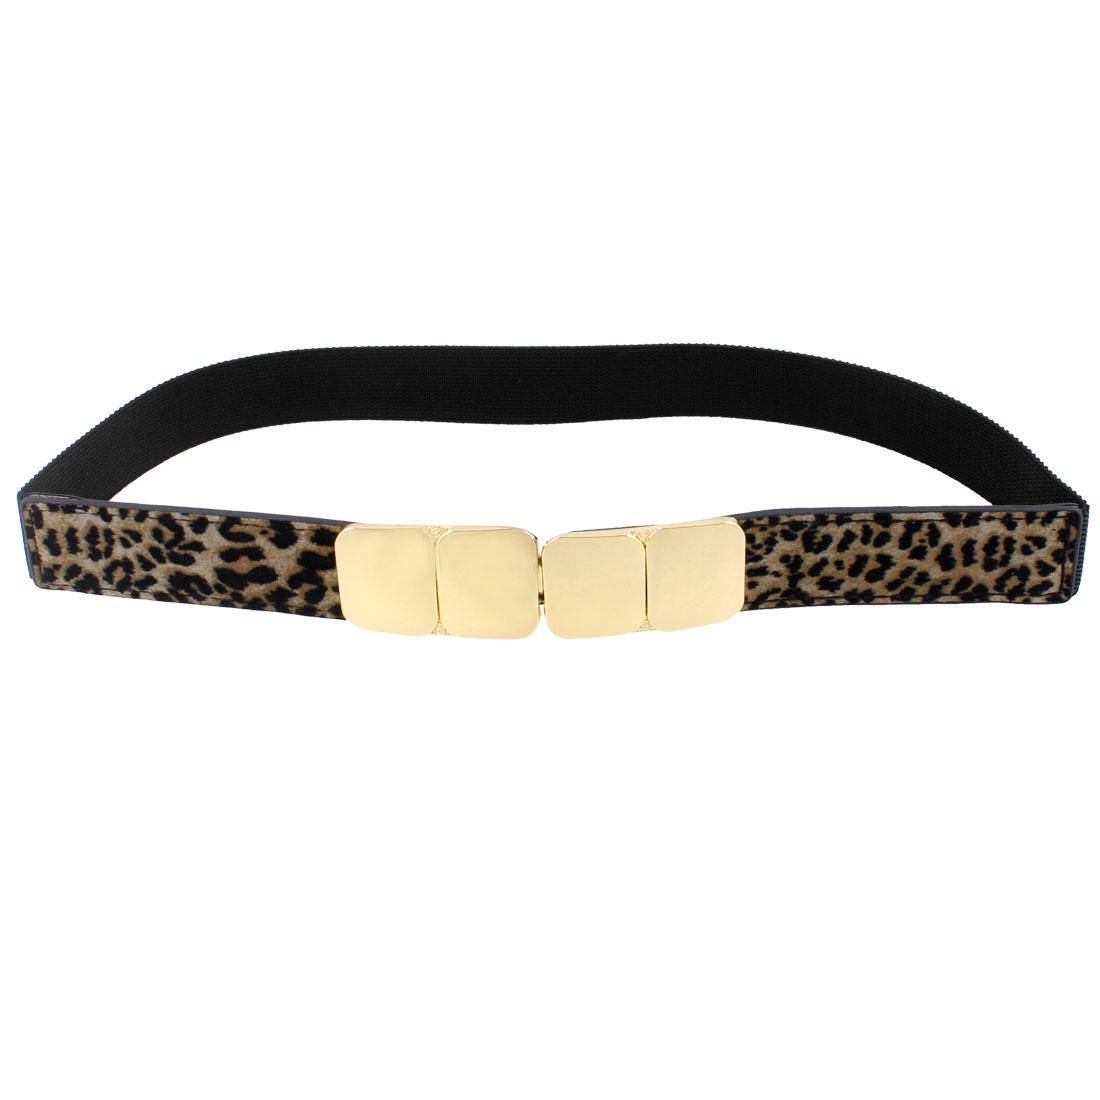 Interlocking Buckle Leopard Pattern Stretchy Waistband Waistbelt Brown Black for Ladies Girl